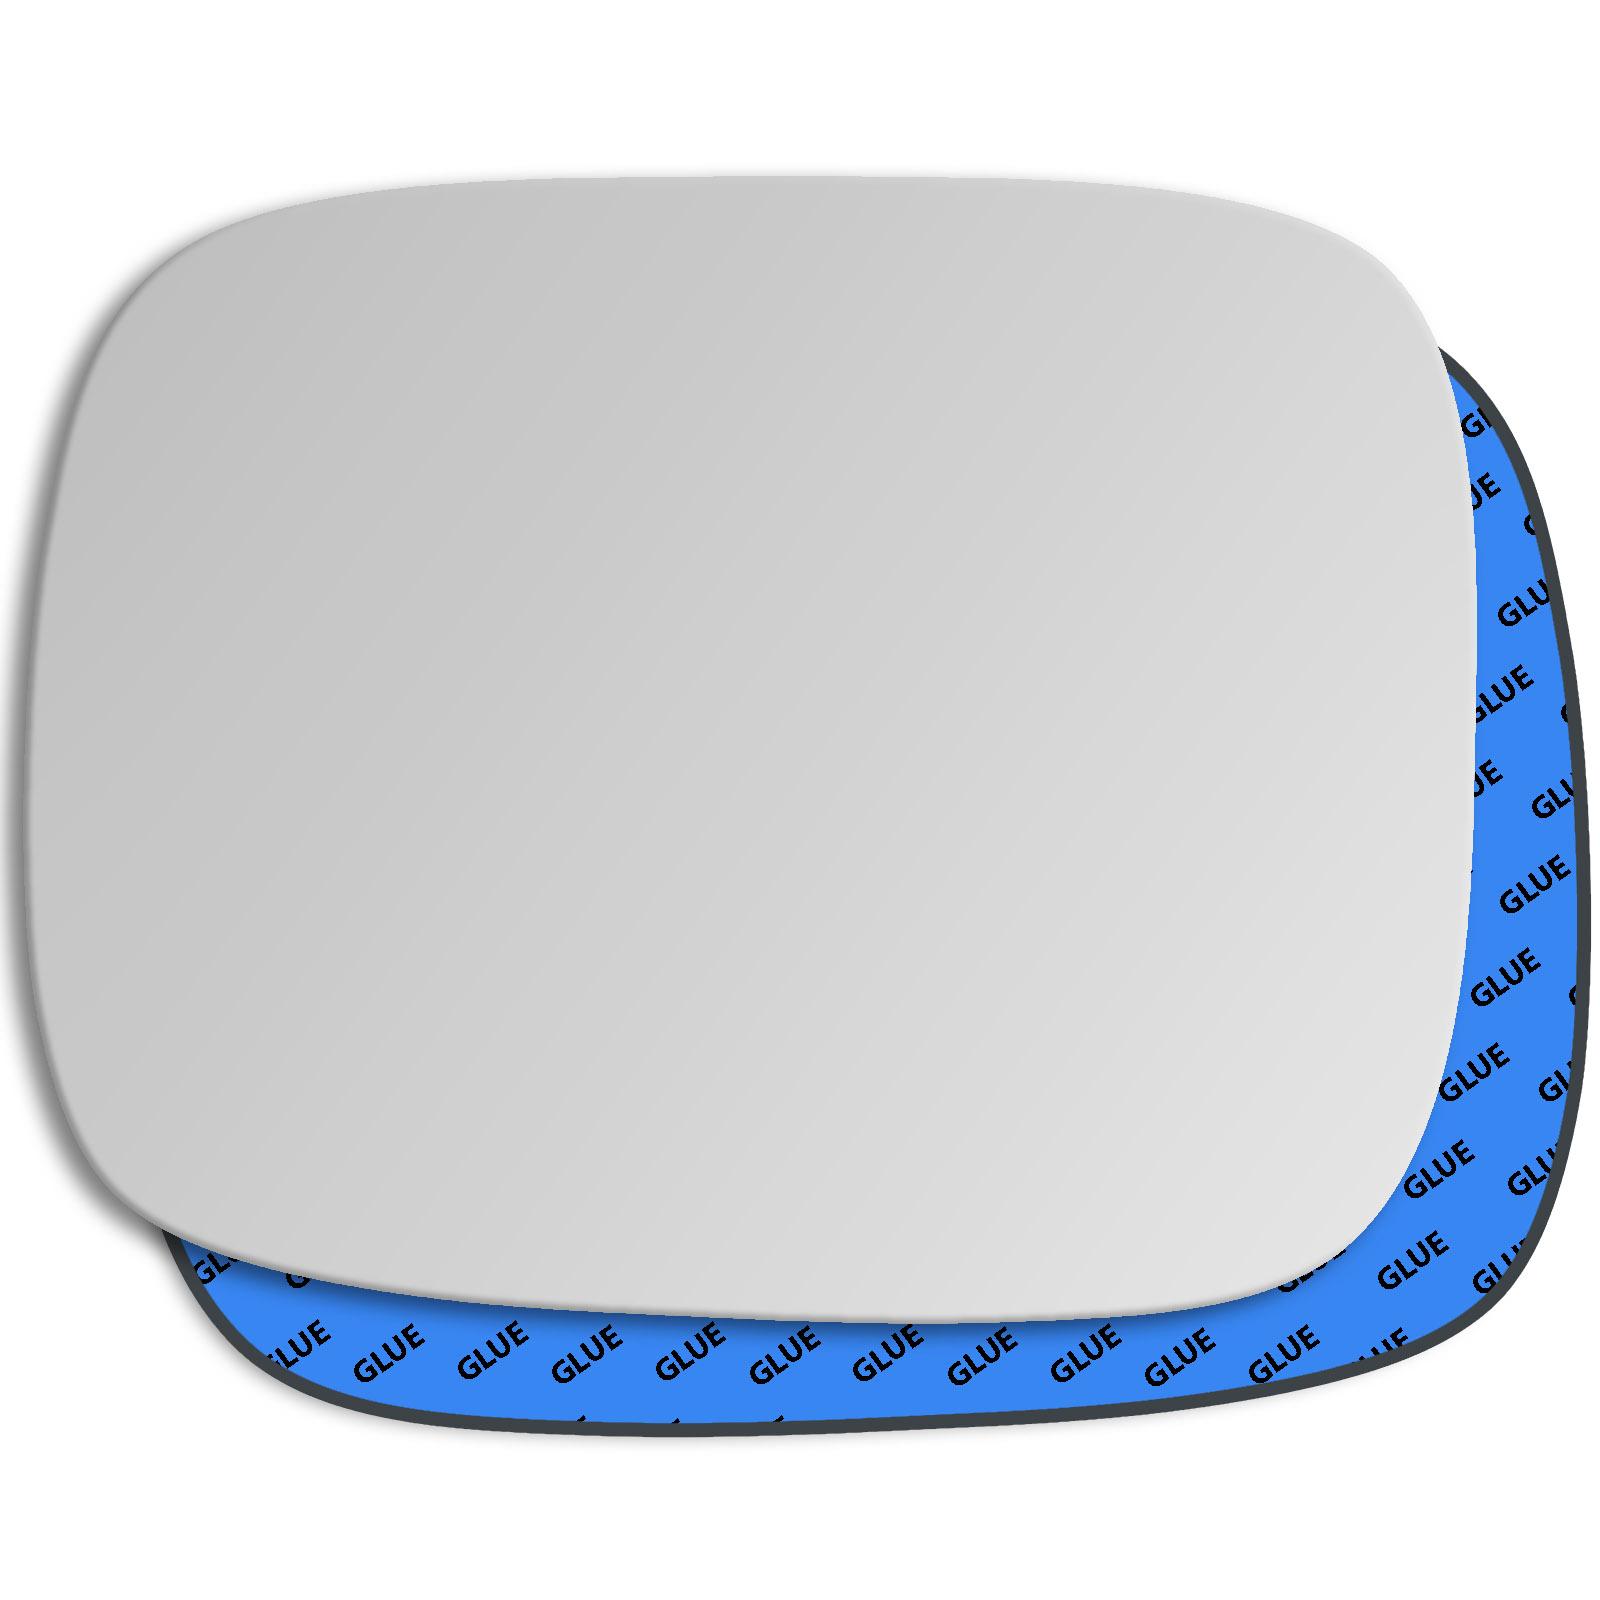 Left Hand Passenger Side Mirror Glass for Volvo XC90 2007-2014 0401LS